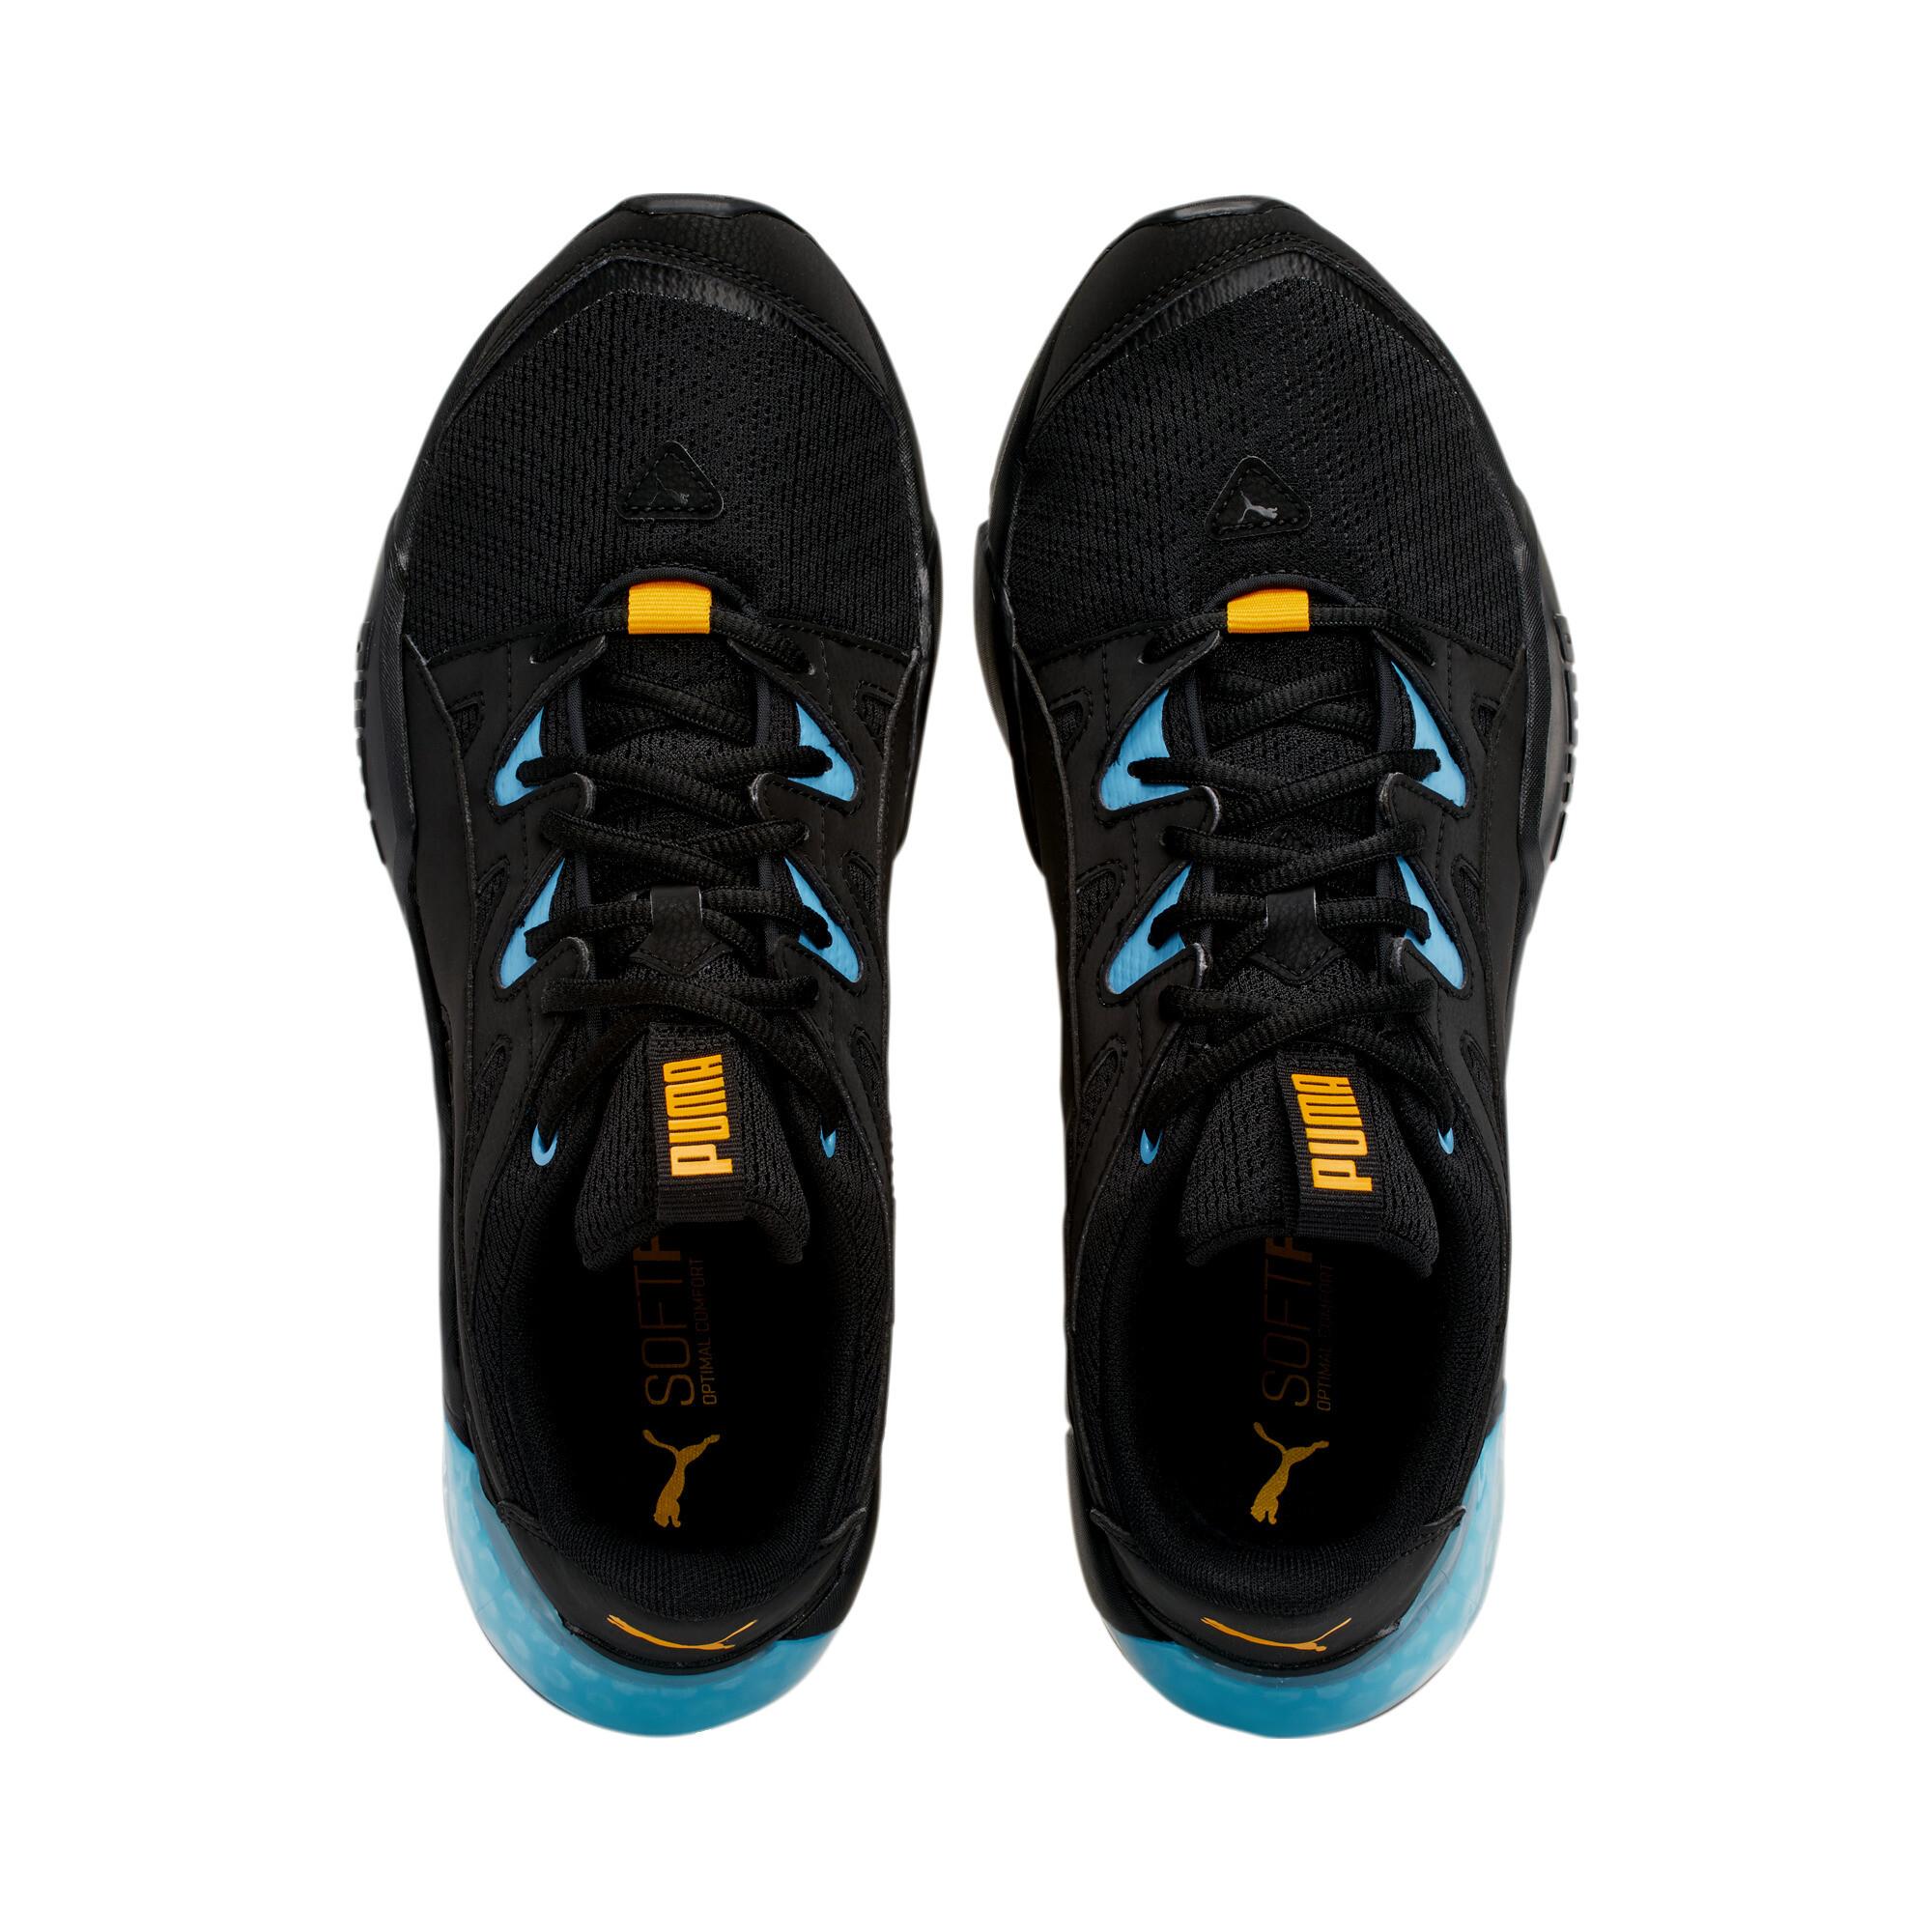 PUMA-Men-039-s-CELL-Pharos-Training-Shoes thumbnail 25